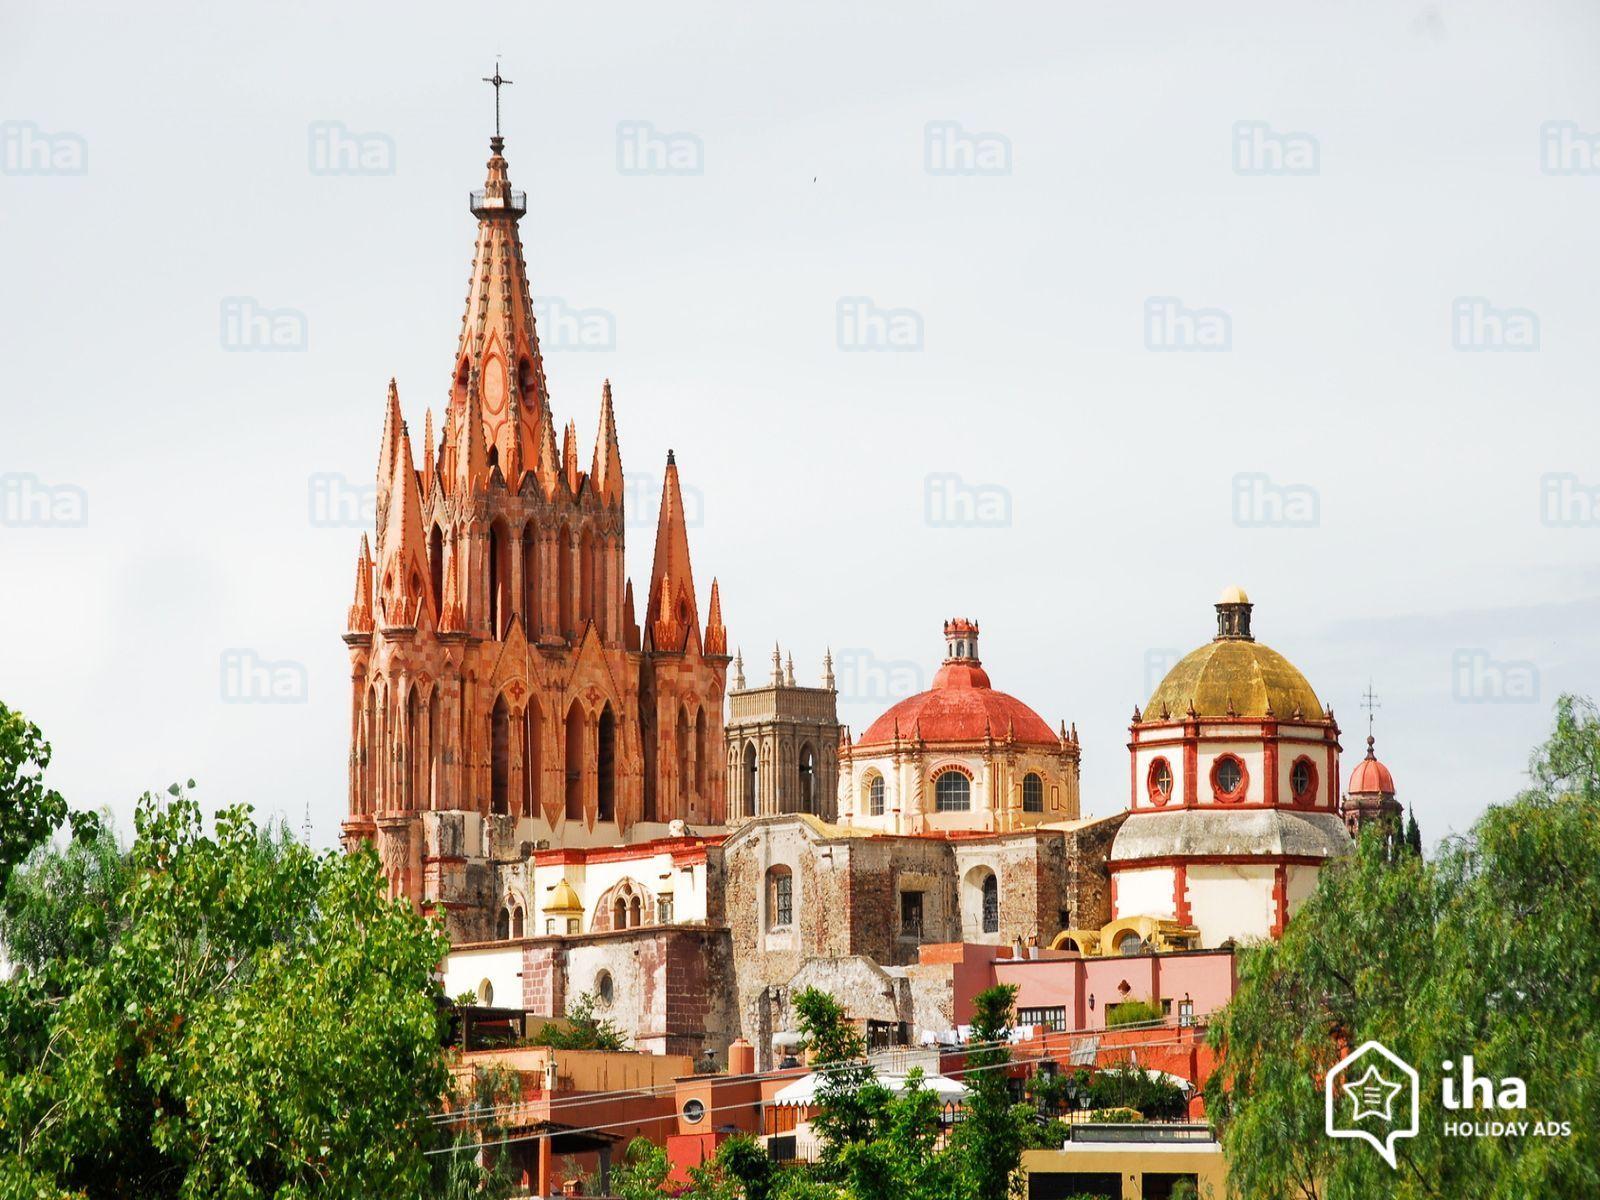 C:\Users\User\Downloads\Сан-Мигель-де-Альенде-San-miguel-arcangel-церковь.jpeg